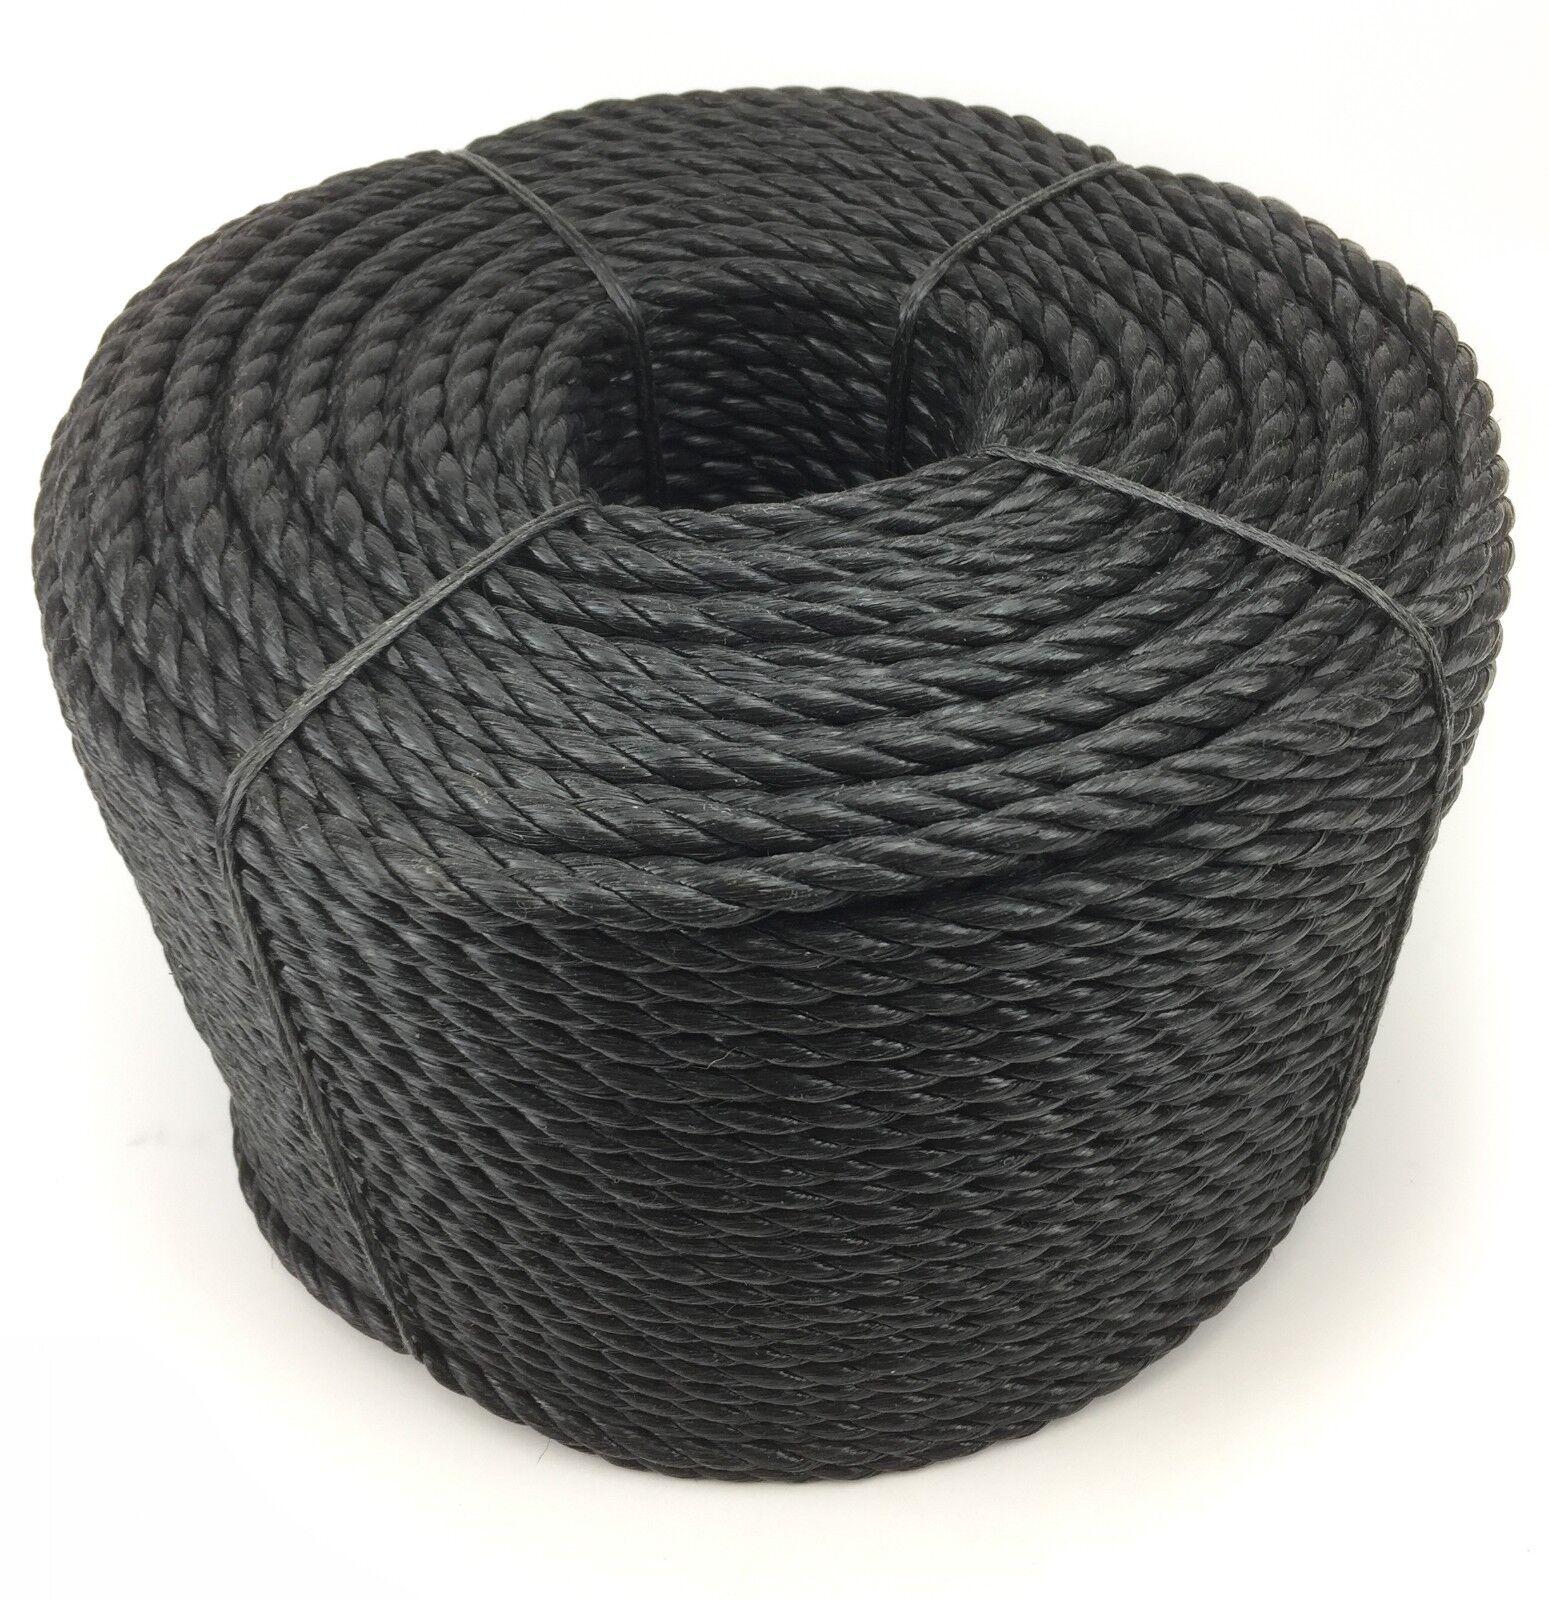 Negro 3 Filamentos Polipropileno 8mm, 10mm And 12mm Barato Nailon Retorcido